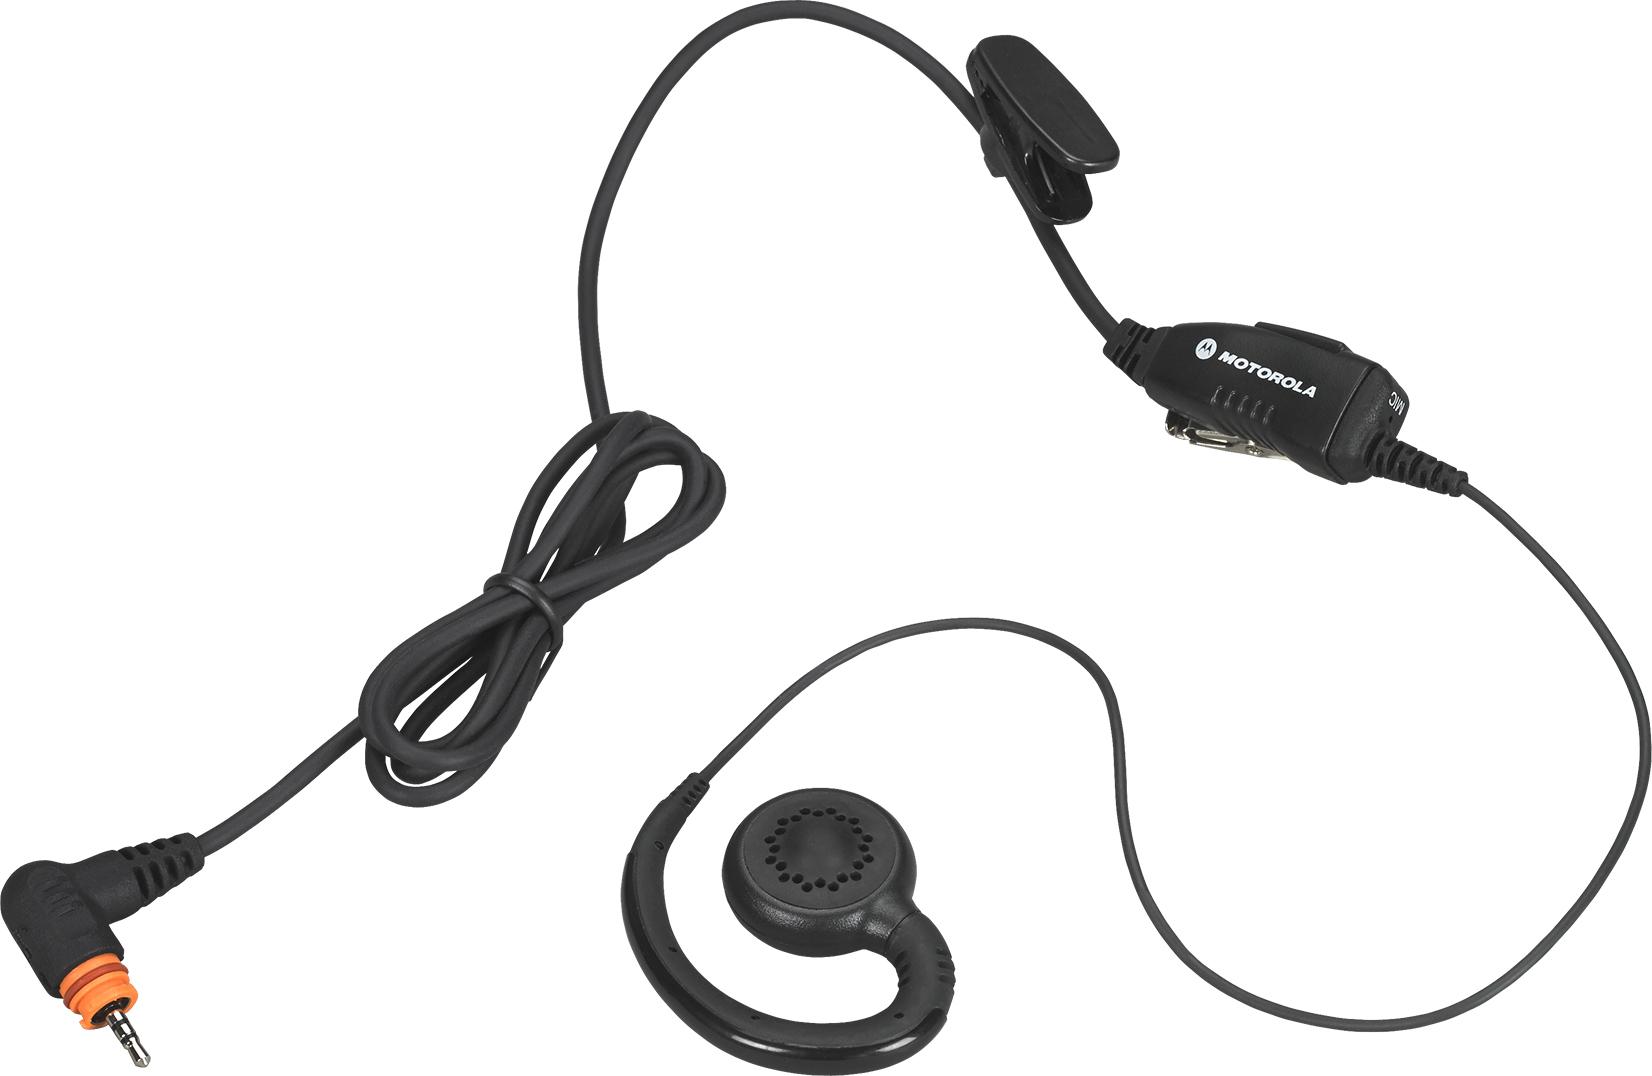 Motorola PMLN7189 - Enkel handsfree med öronbygel  59a048339aedc